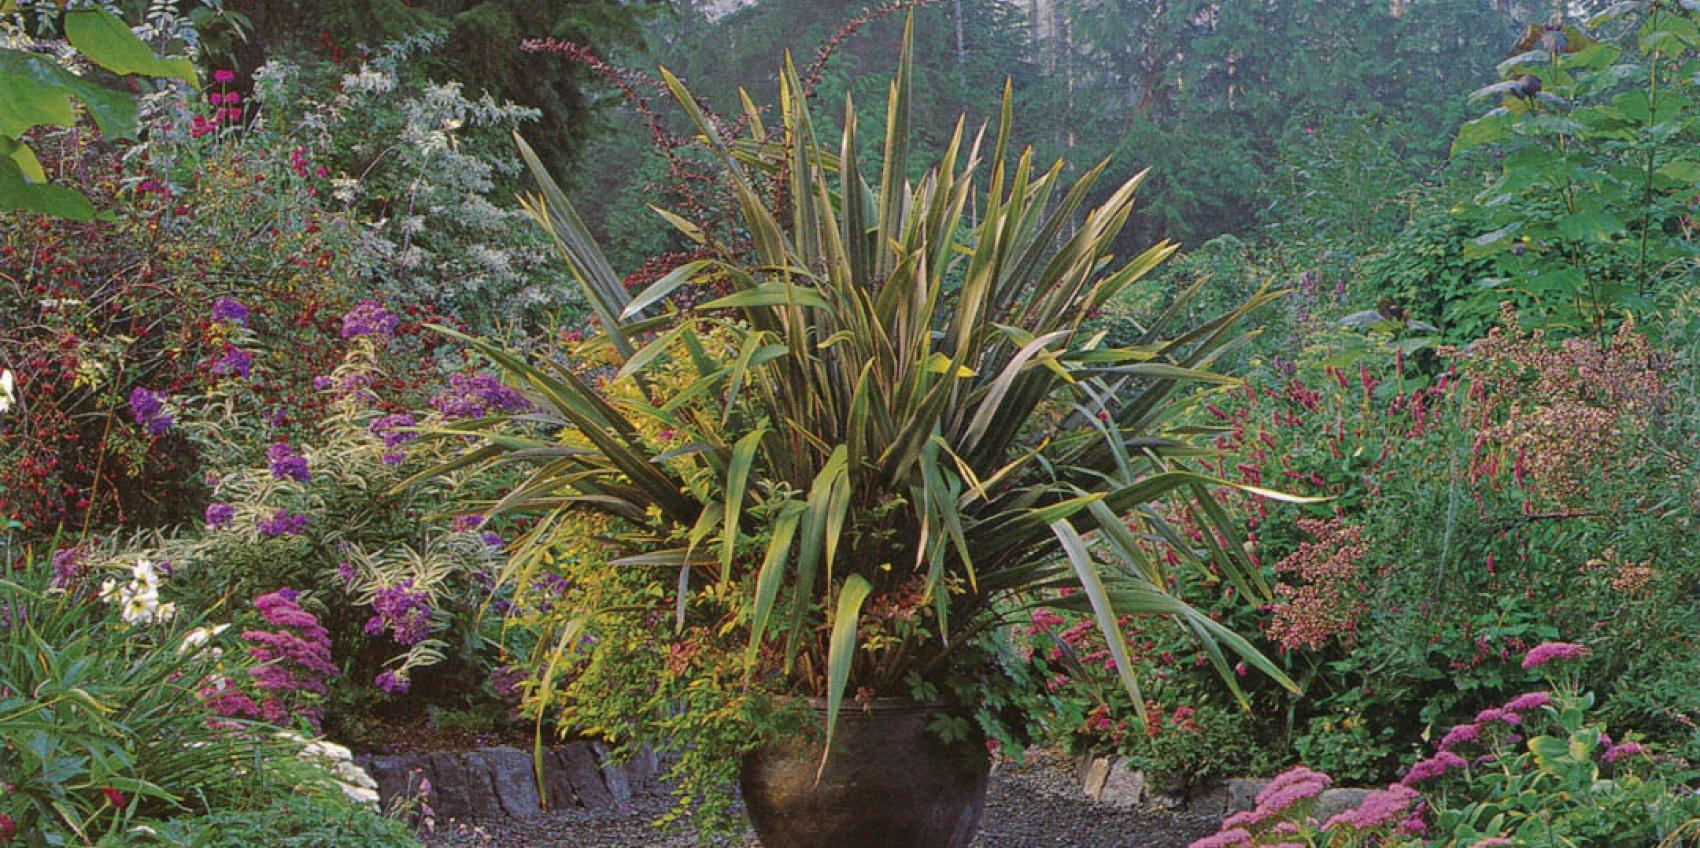 Heronswood Garden | American Public Gardens Association